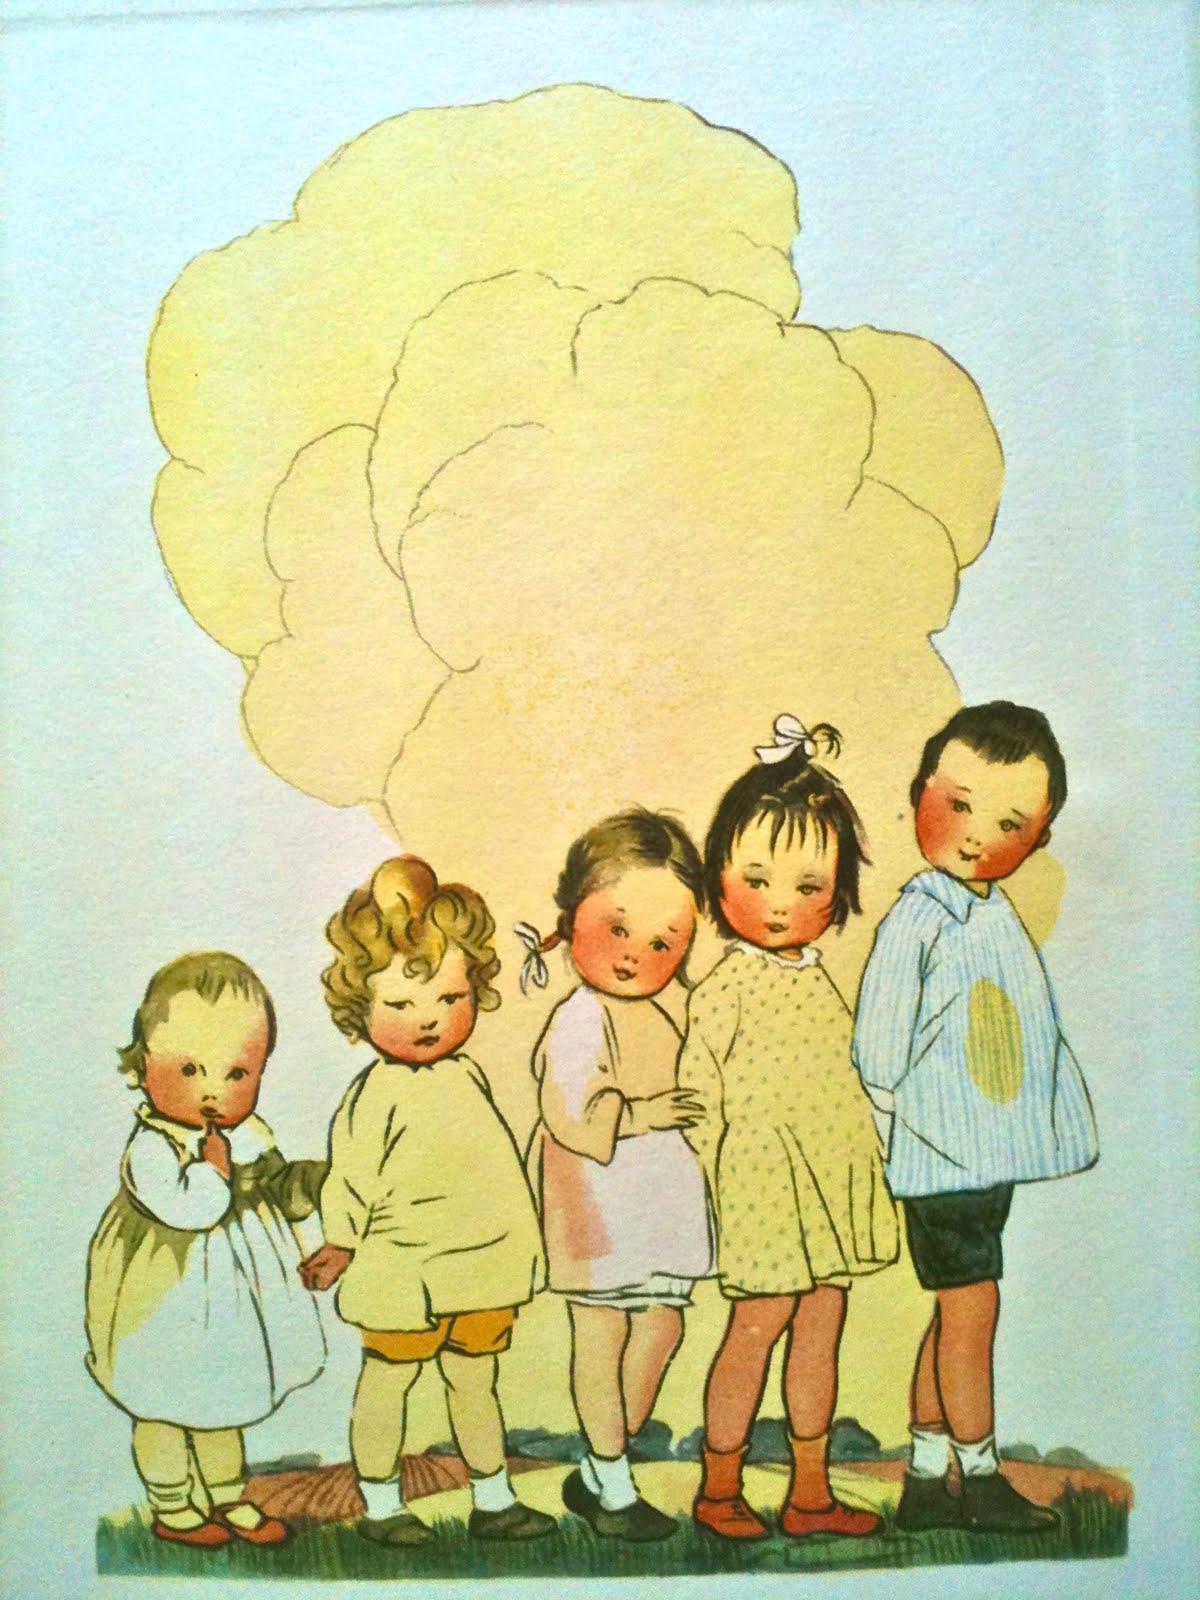 Rudywilf: Susan Beatrice Pearse illustrator